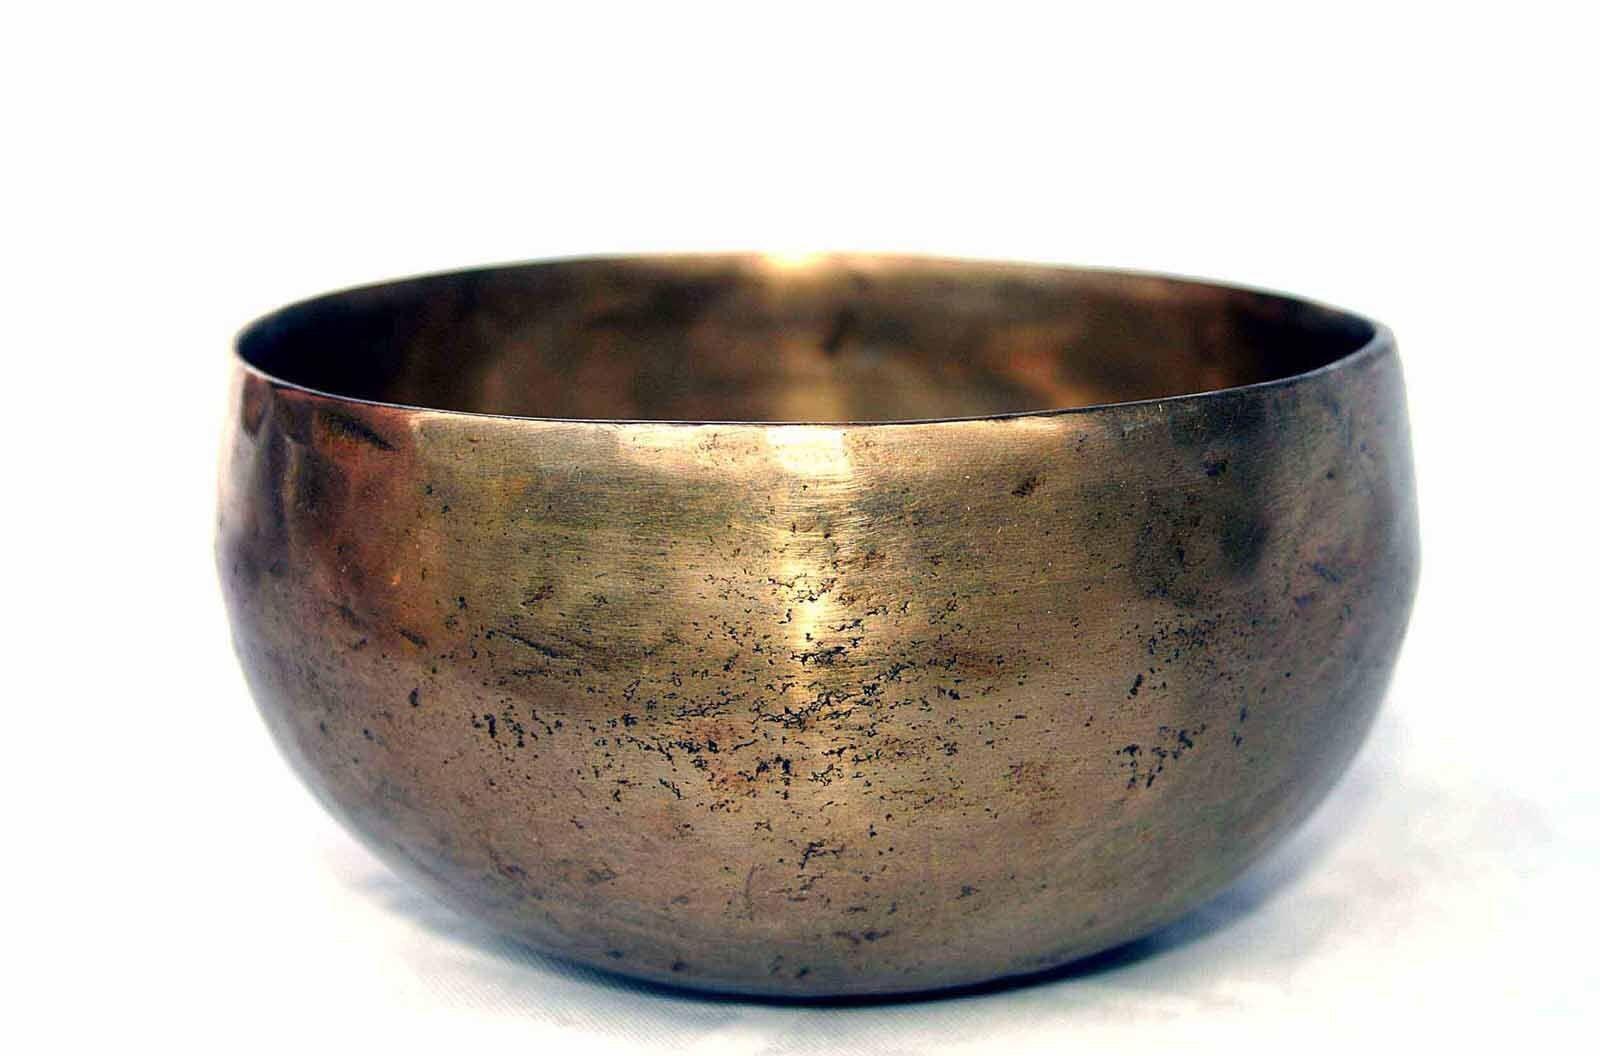 Klangschale Singing Bowl Planetenton Mondkulmination Esoterik Hörprobe 537g M69F